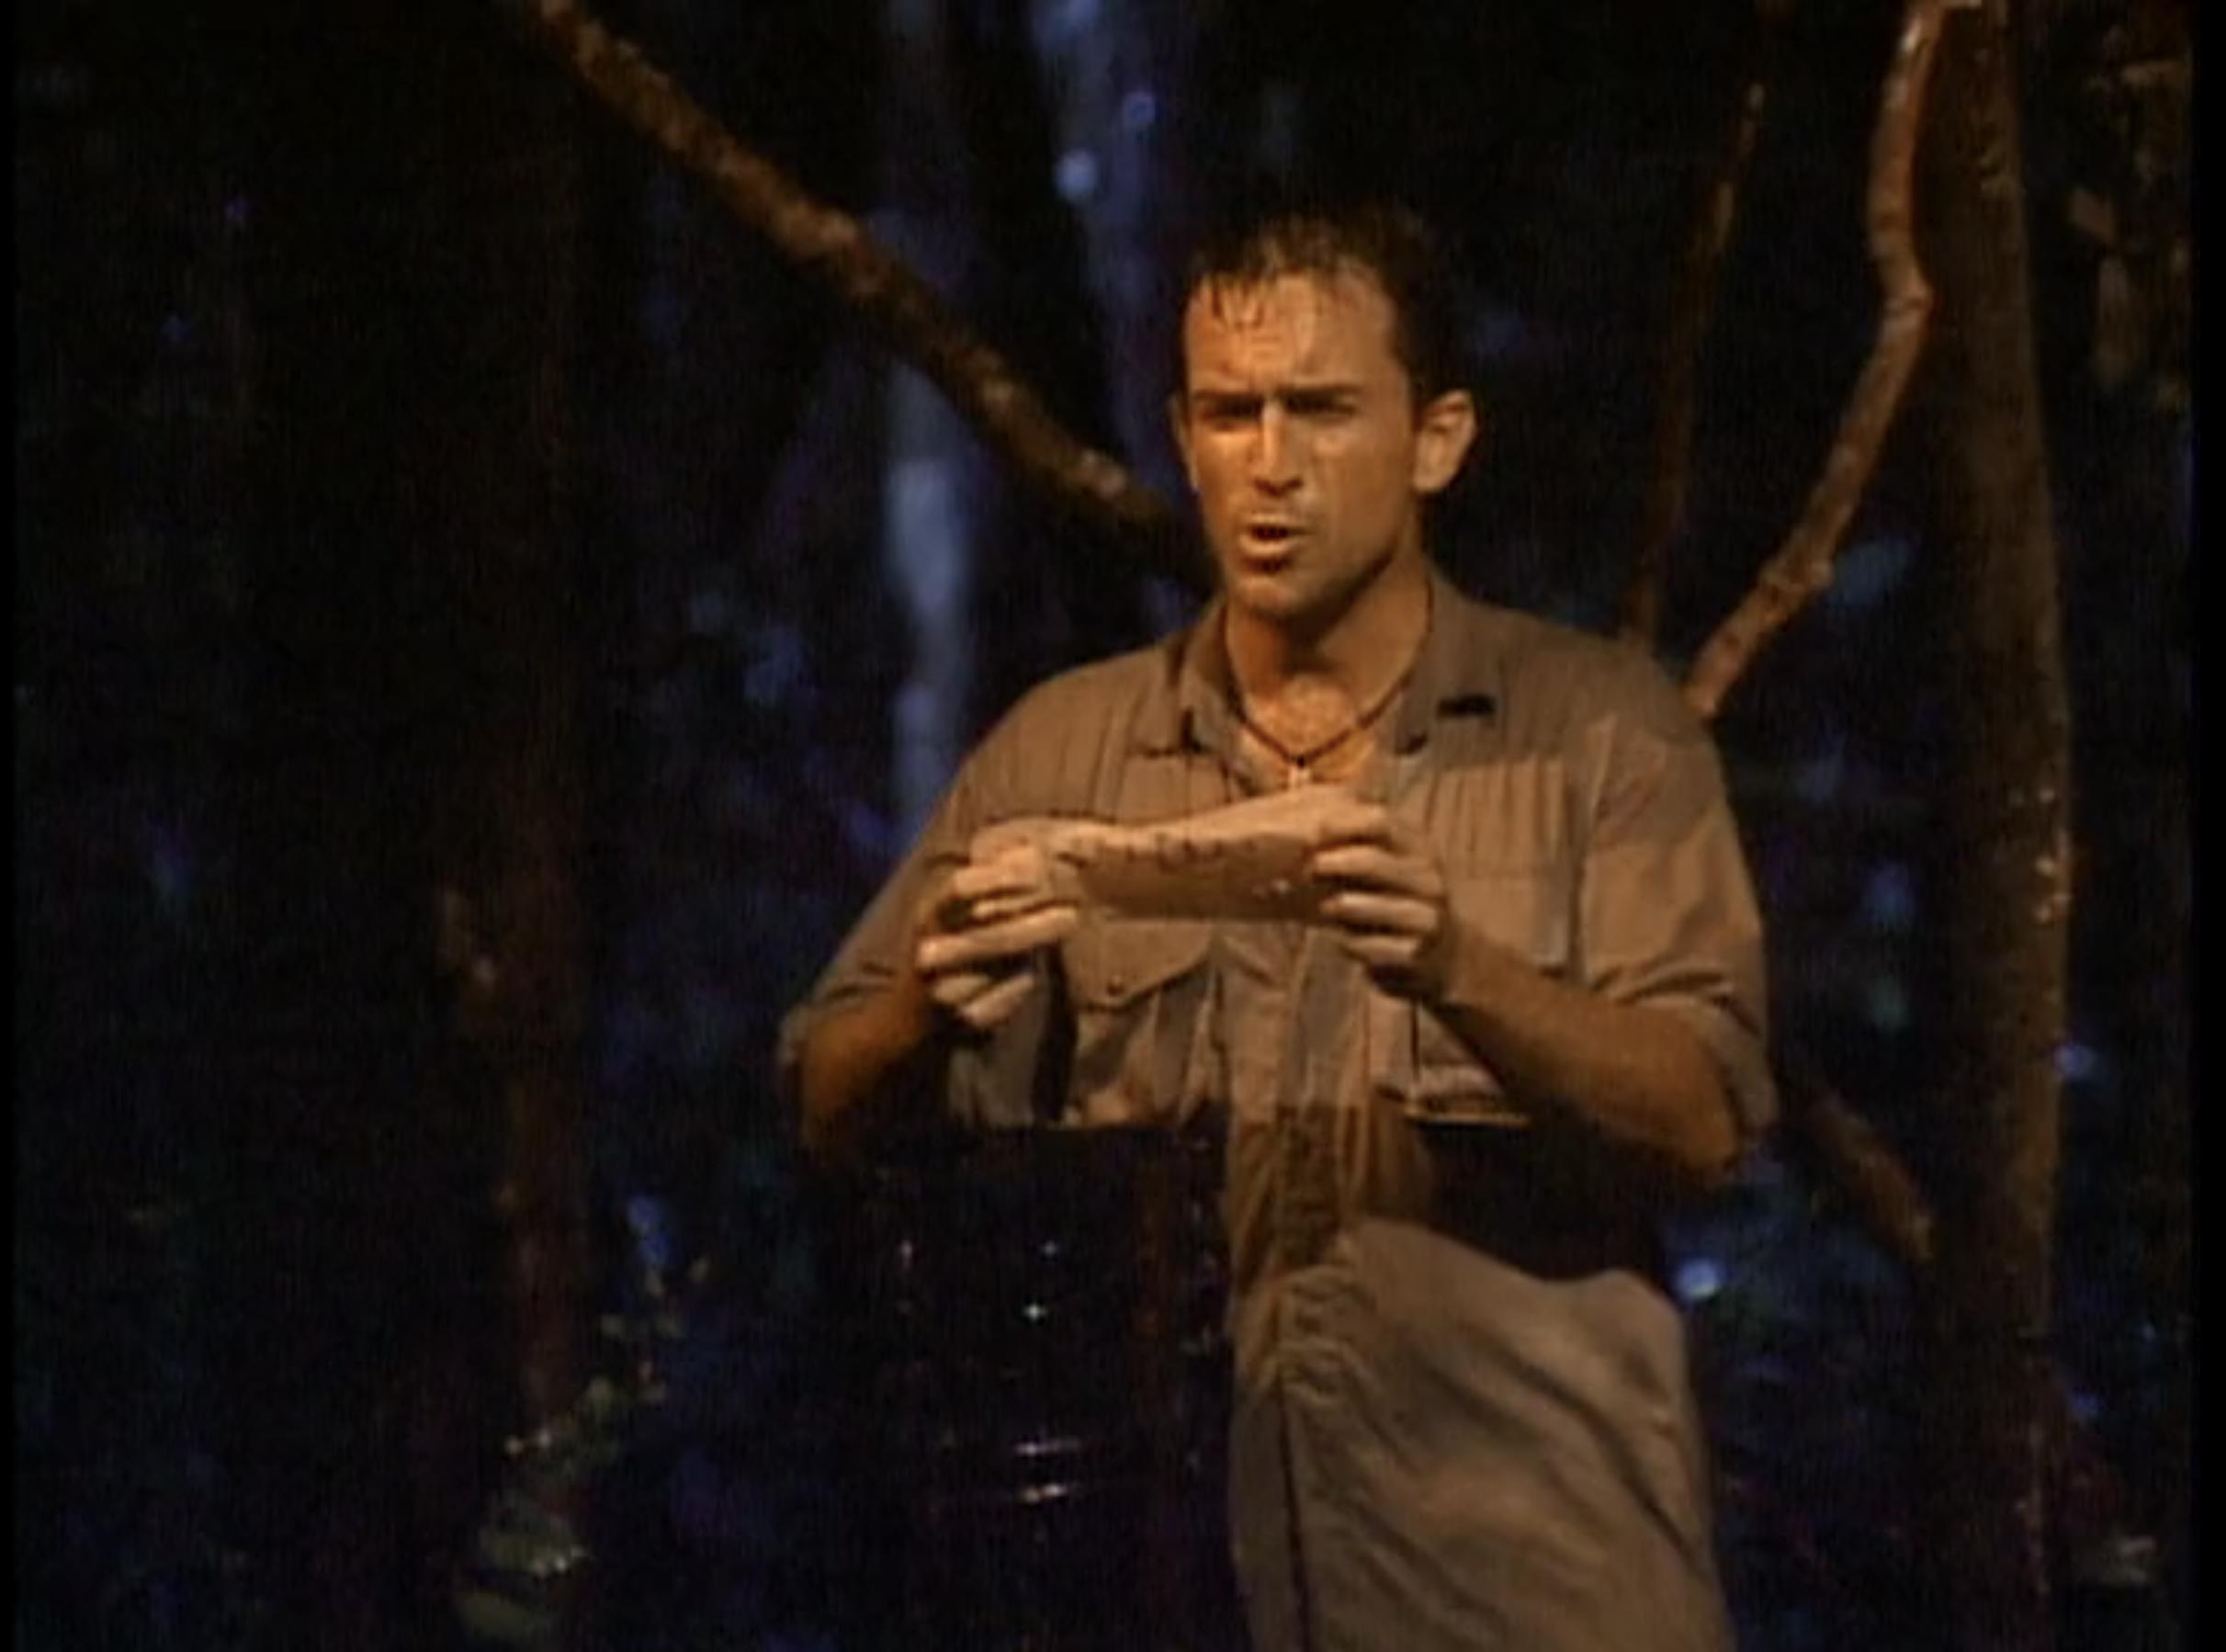 Wet Jeff Probst holds up a damp, illegible vote.